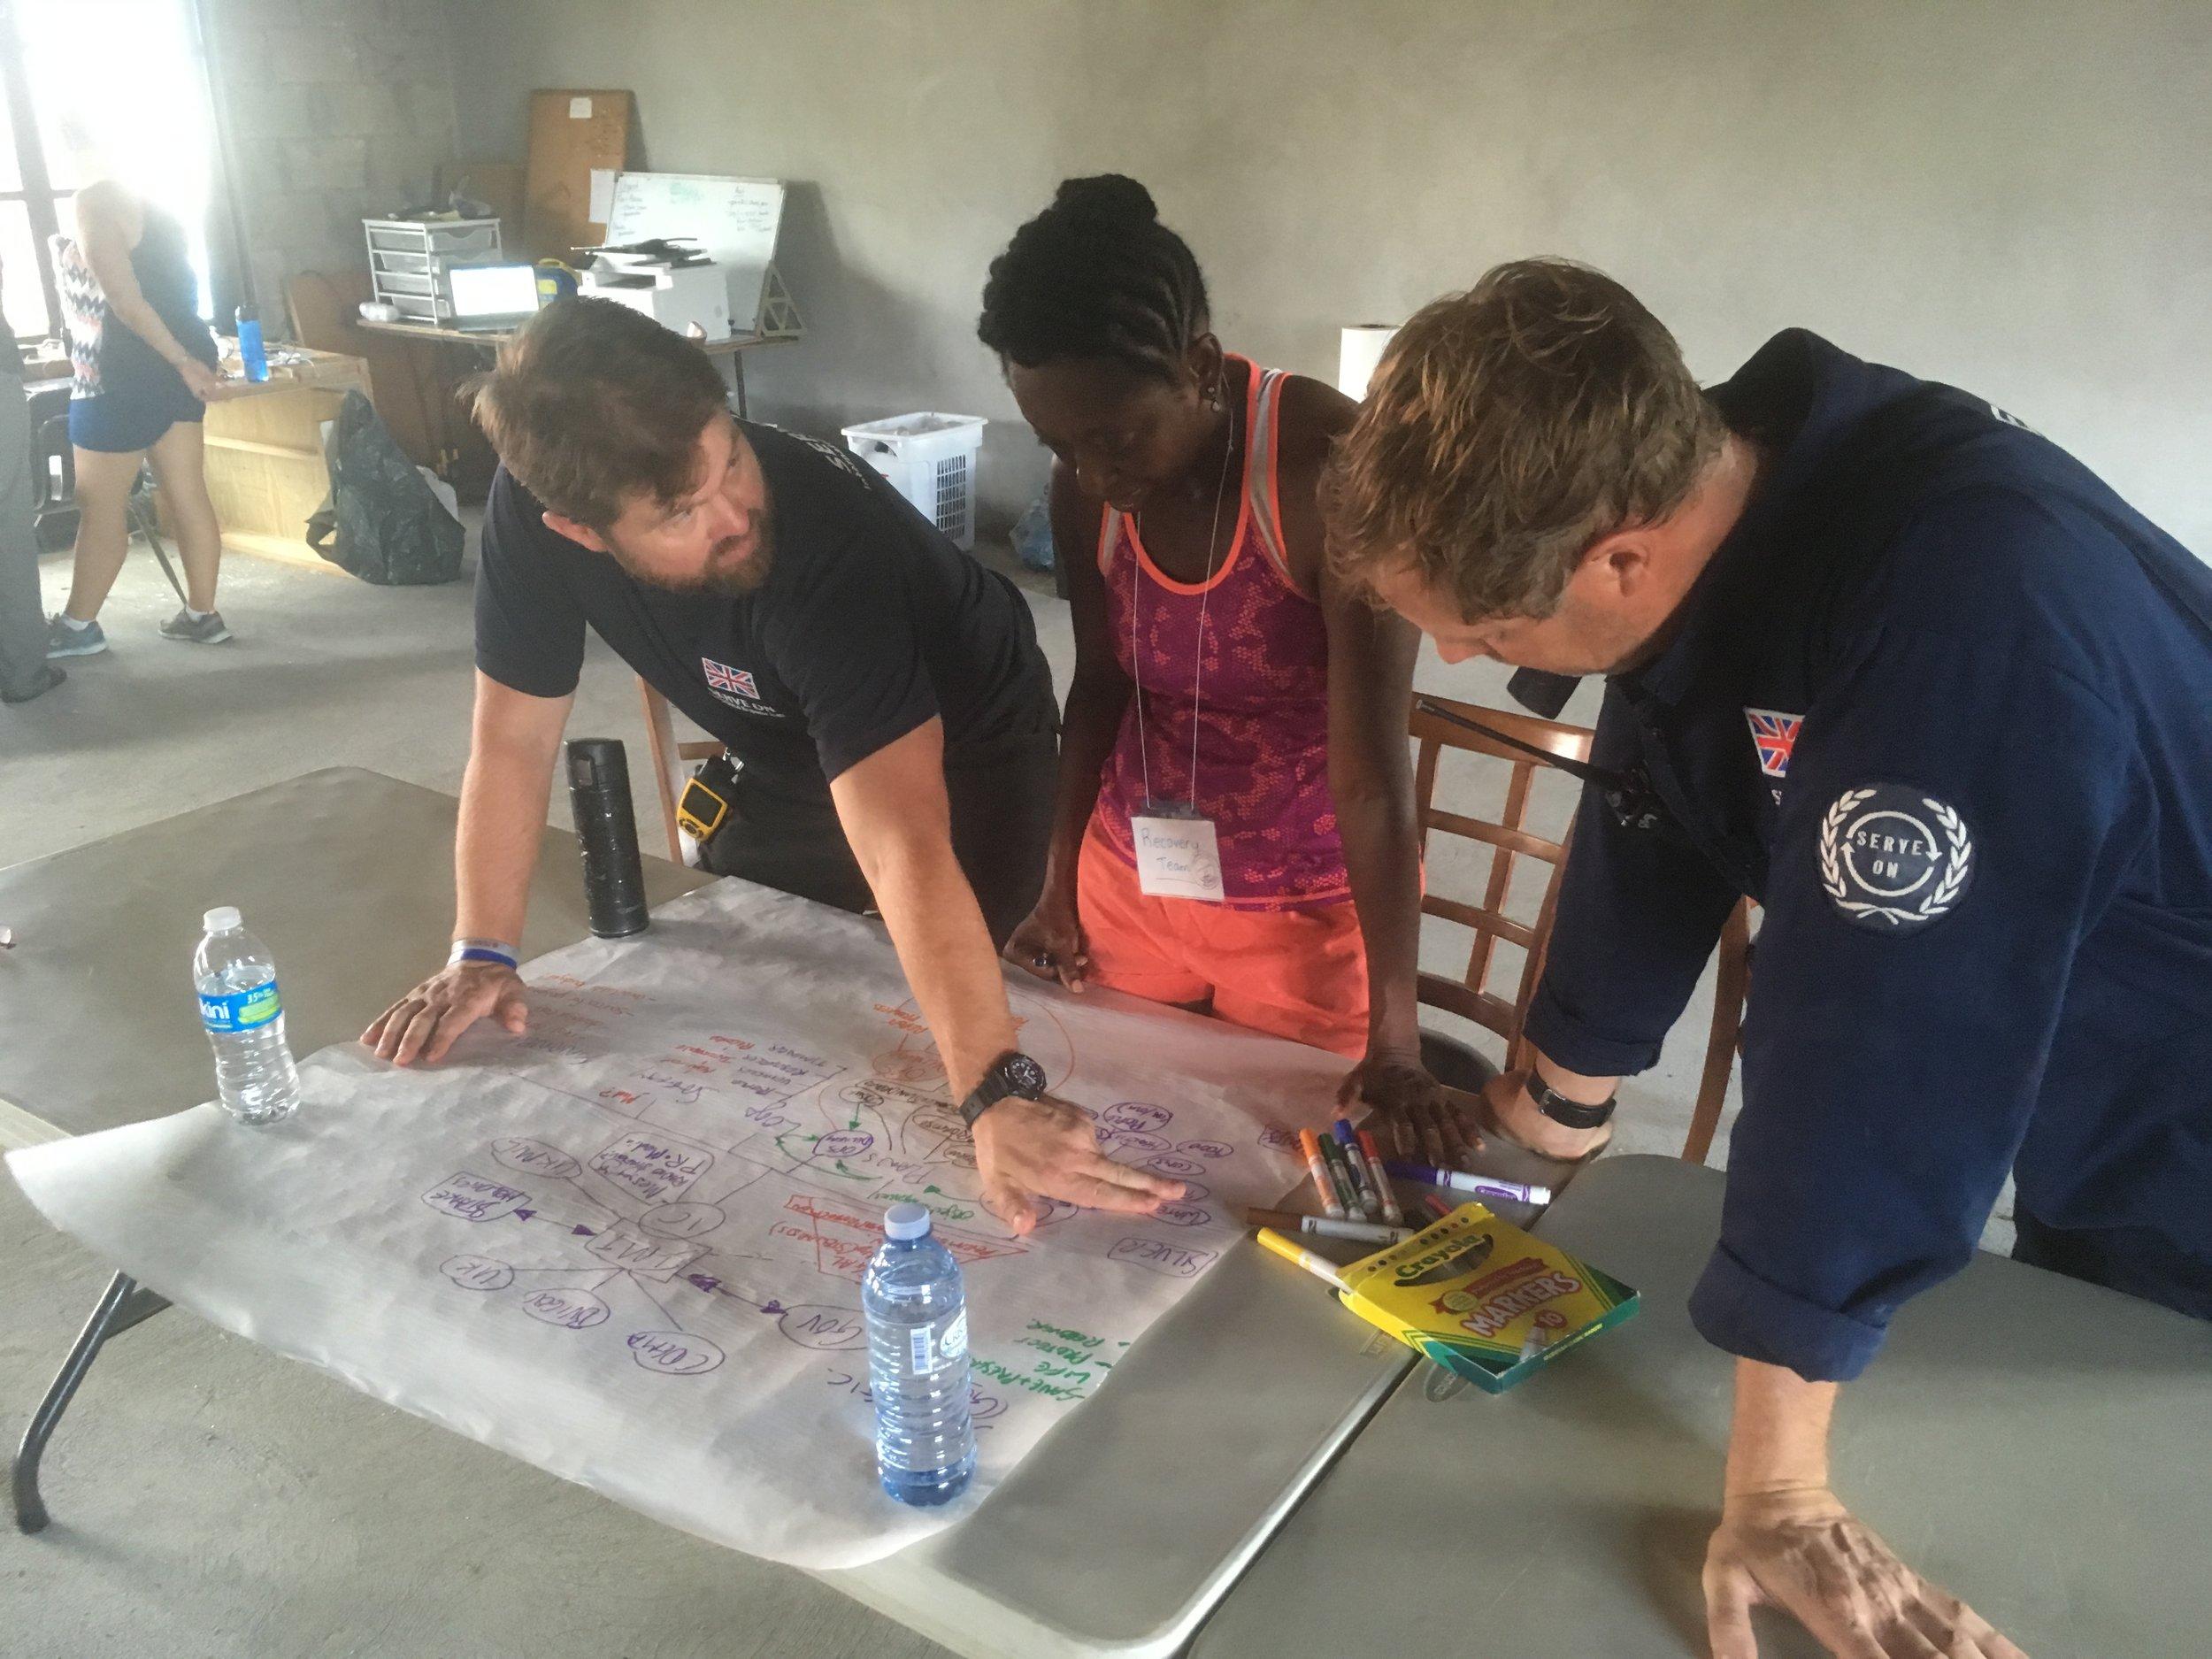 Serve On's International Response Team volunteers helping the local community on Virgin Gorda in the wake of Hurricane Irma in September 2017